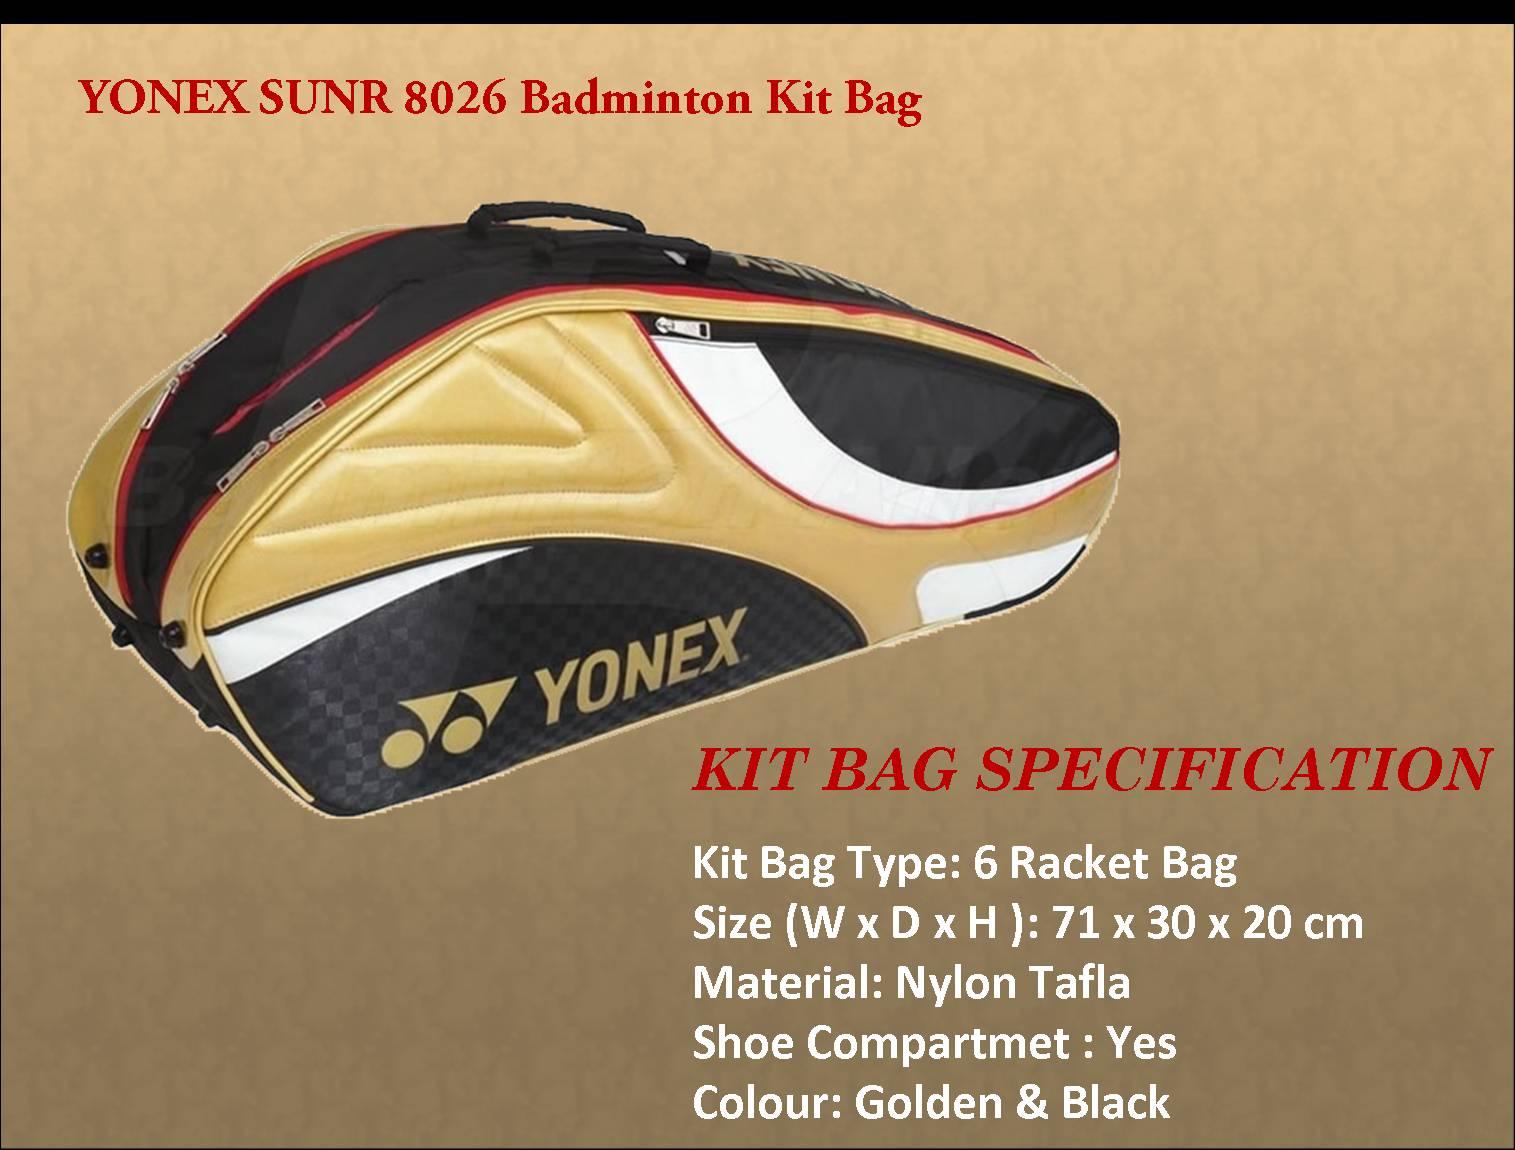 YONEX SUNR 8026 Badminton Kit Bag